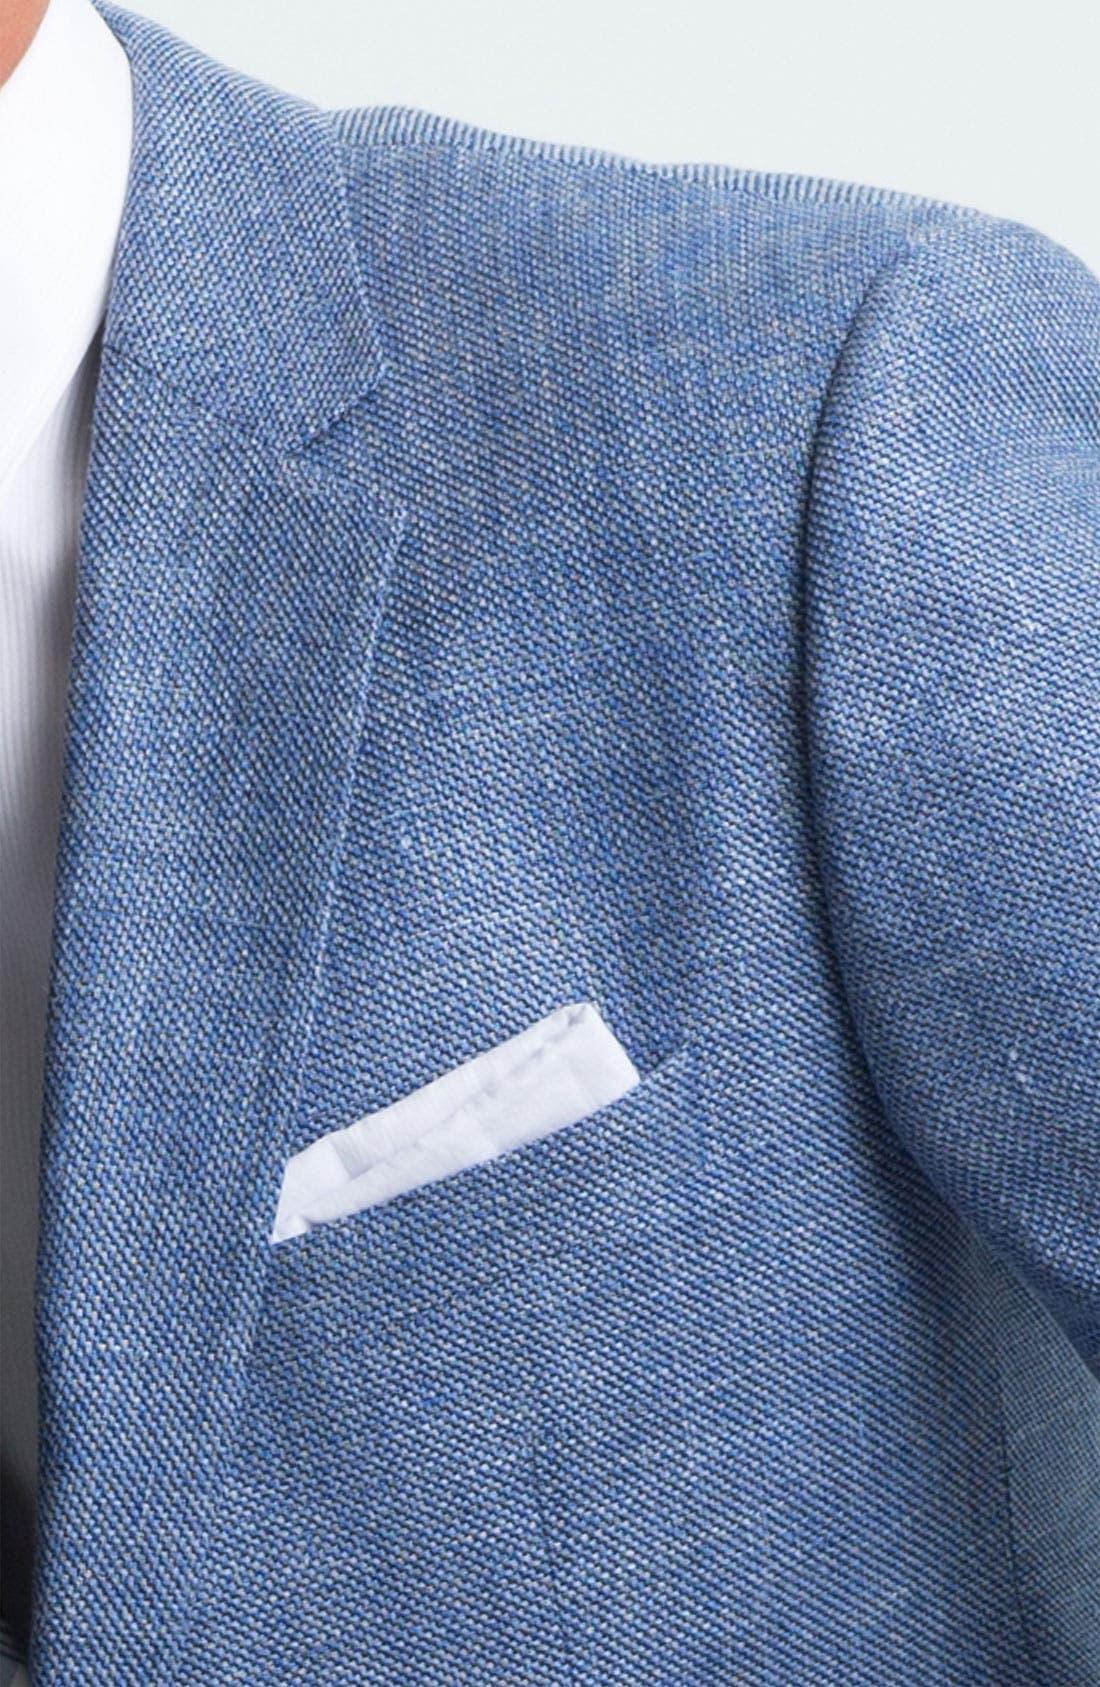 ZZDNUHUGO BOSS, BOSS Black 'Smith' Trim Fit Sportcoat, Alternate thumbnail 4, color, 440